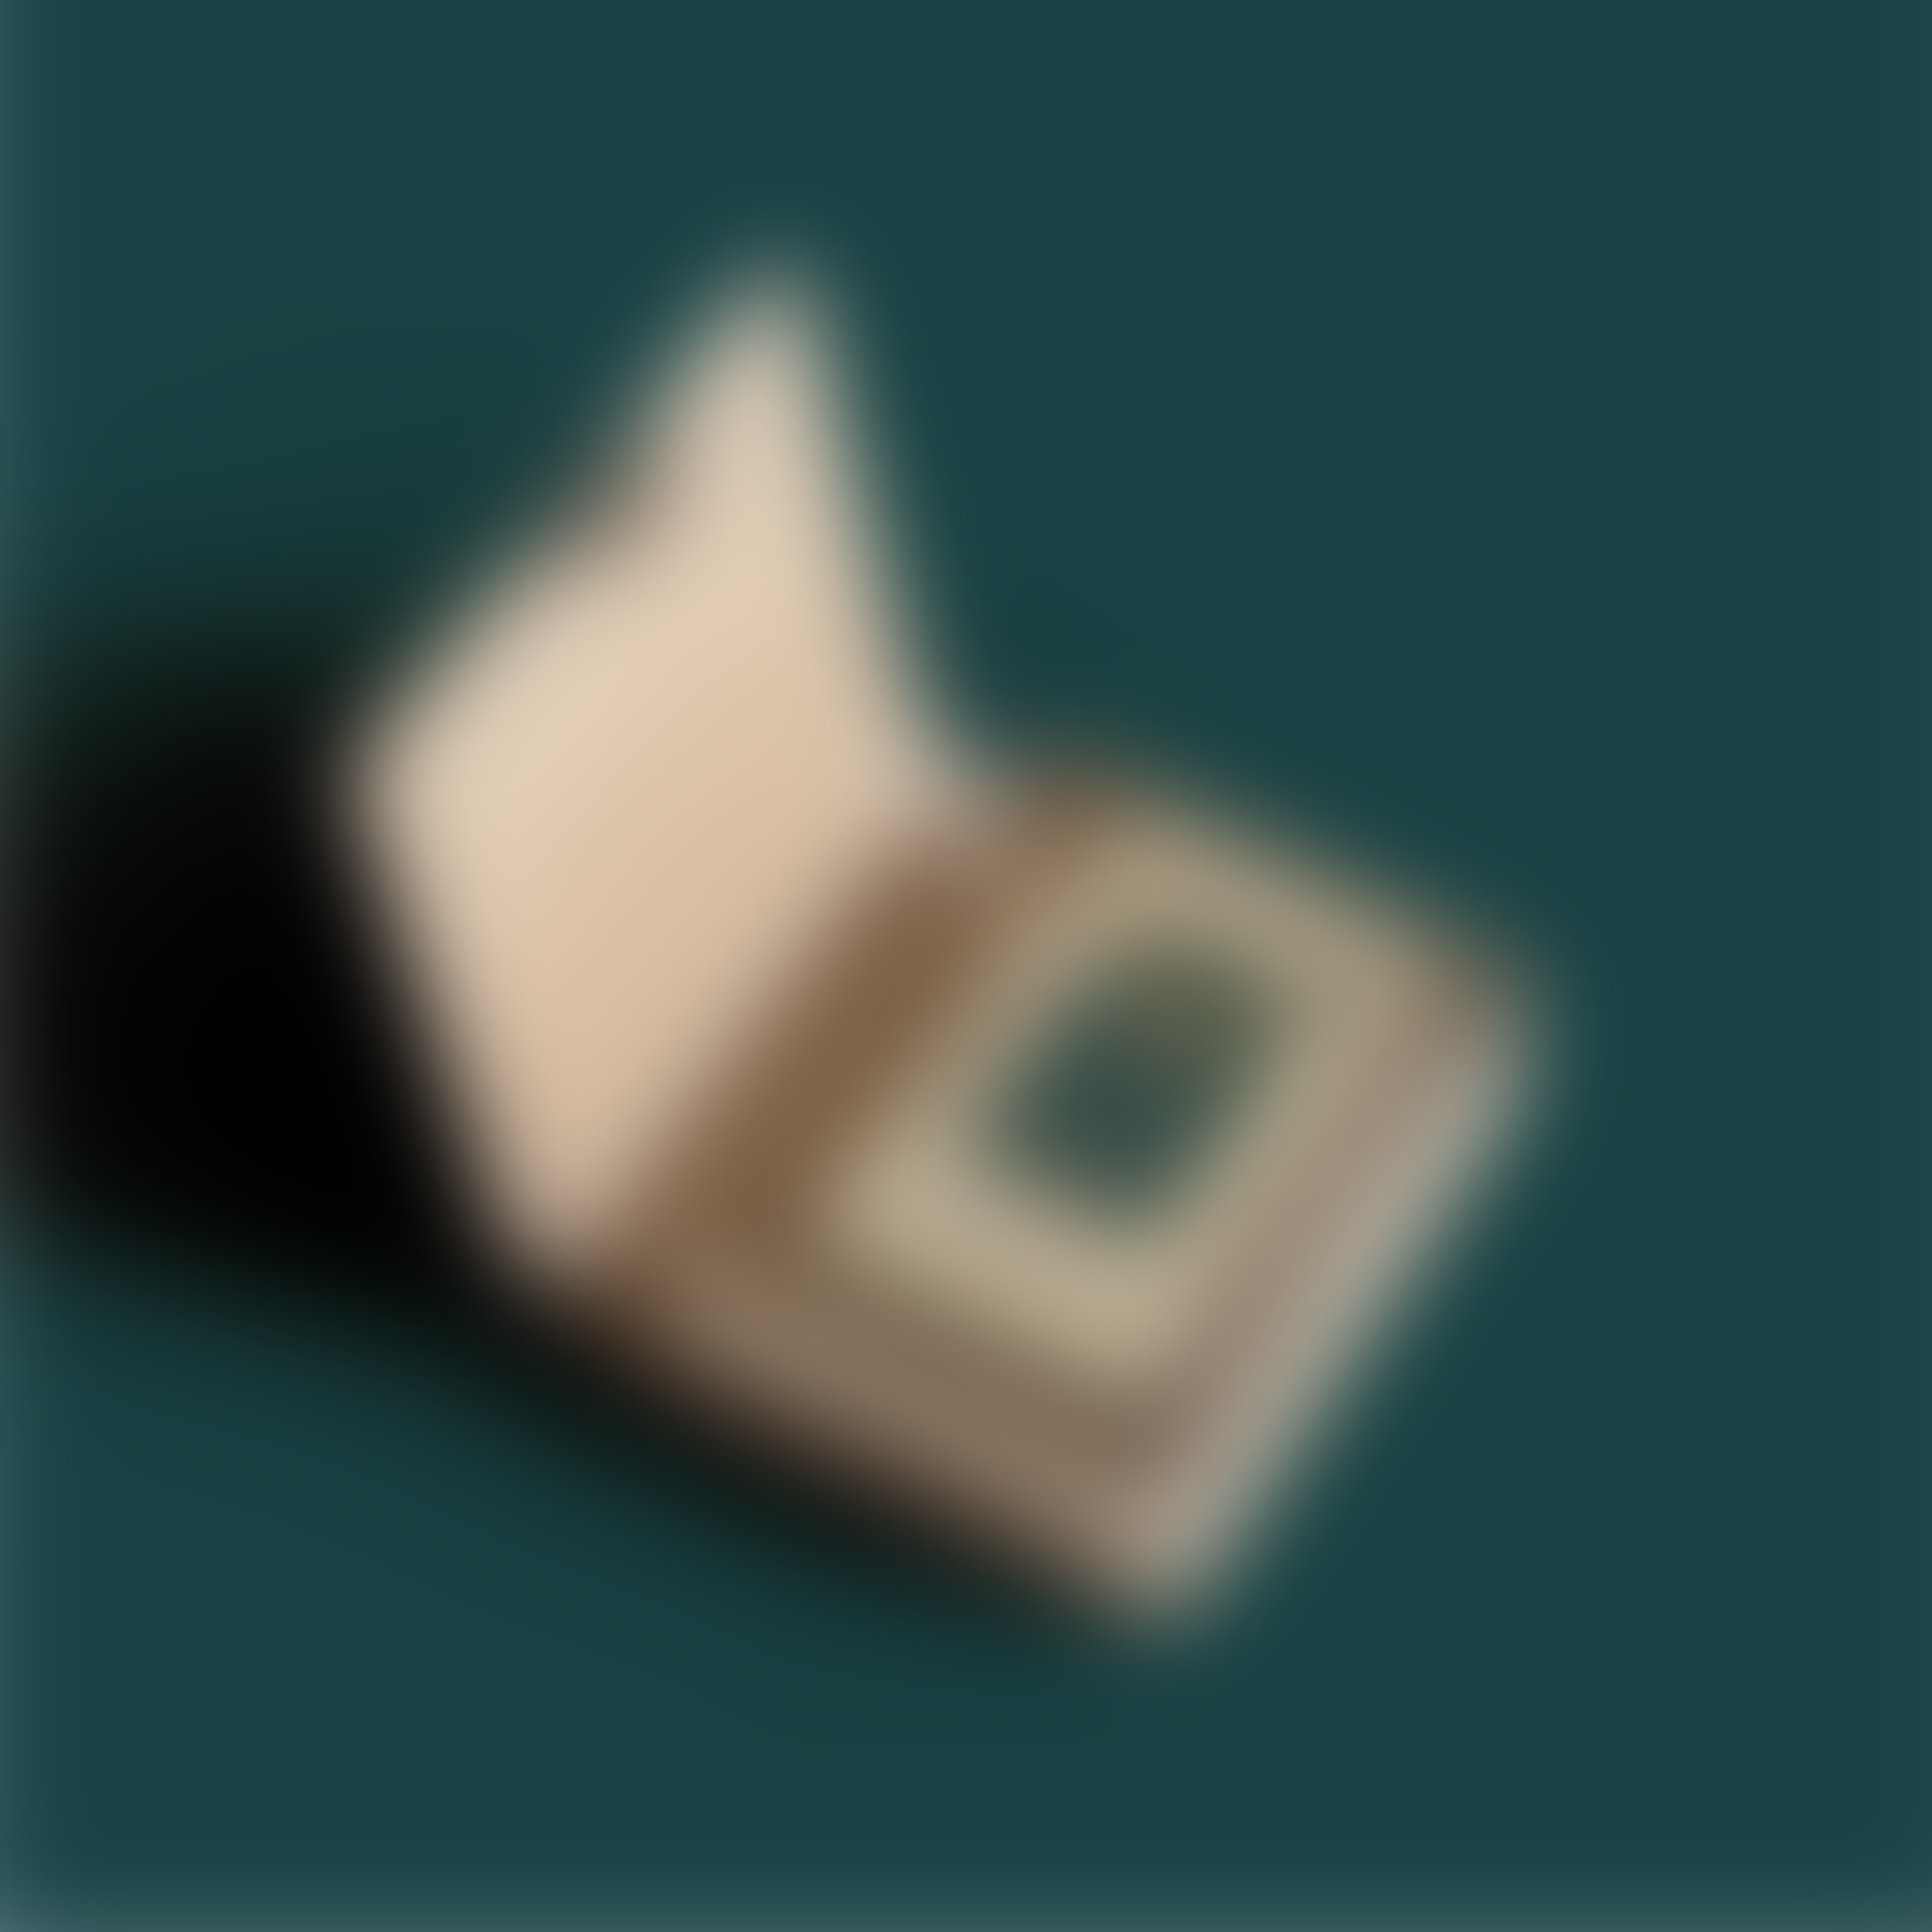 006 Kat Faid lecture in progerss sail crerative ethical eve autocompressfitresizeixlibphp 1 1 0max h2000max w3 D2000q80s8301a29938ab99b2e2fa093347fd0661